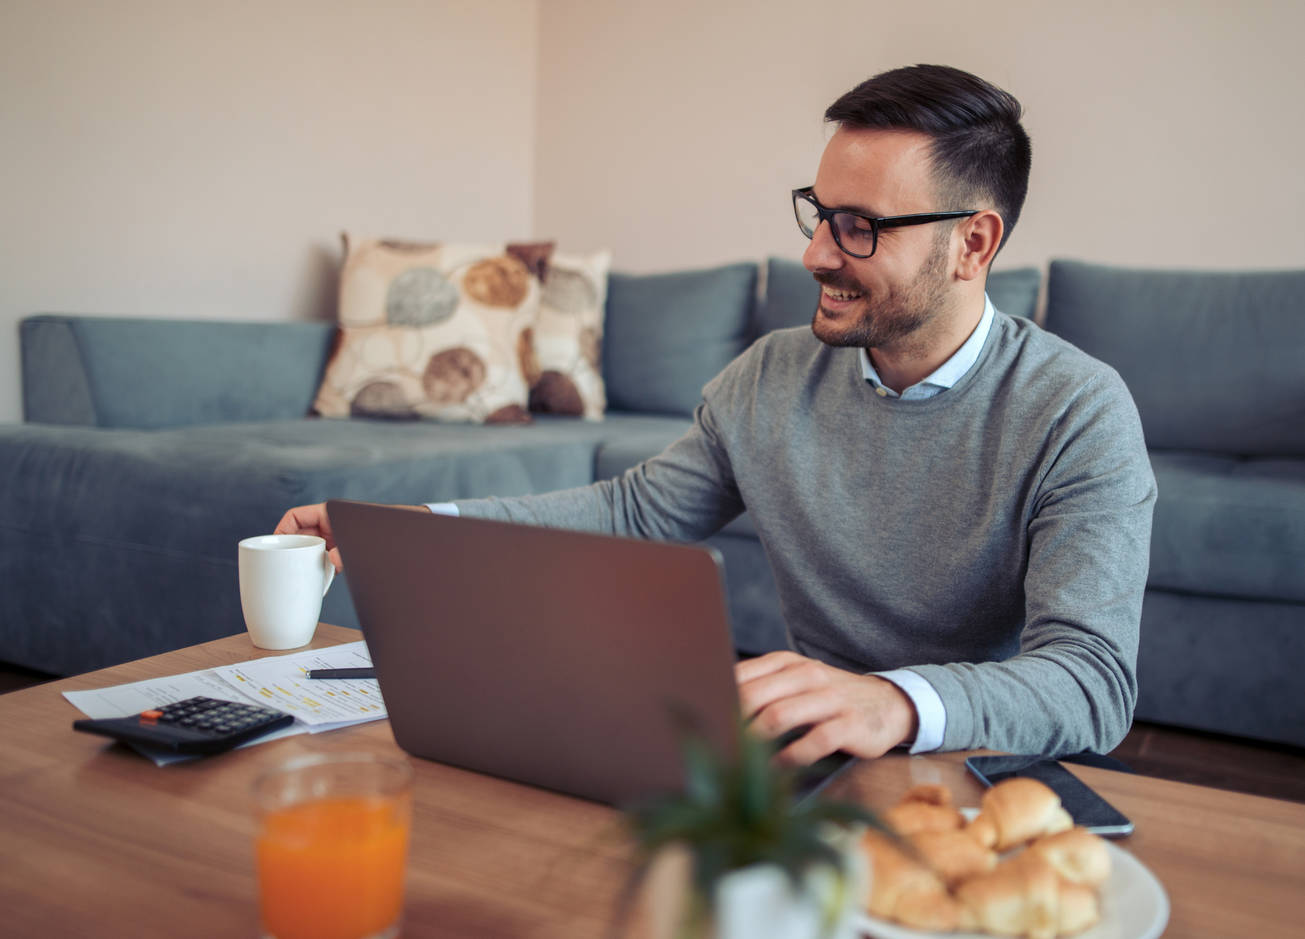 Как эффективно работать дома, сидя на карантине: 5 мужских советов